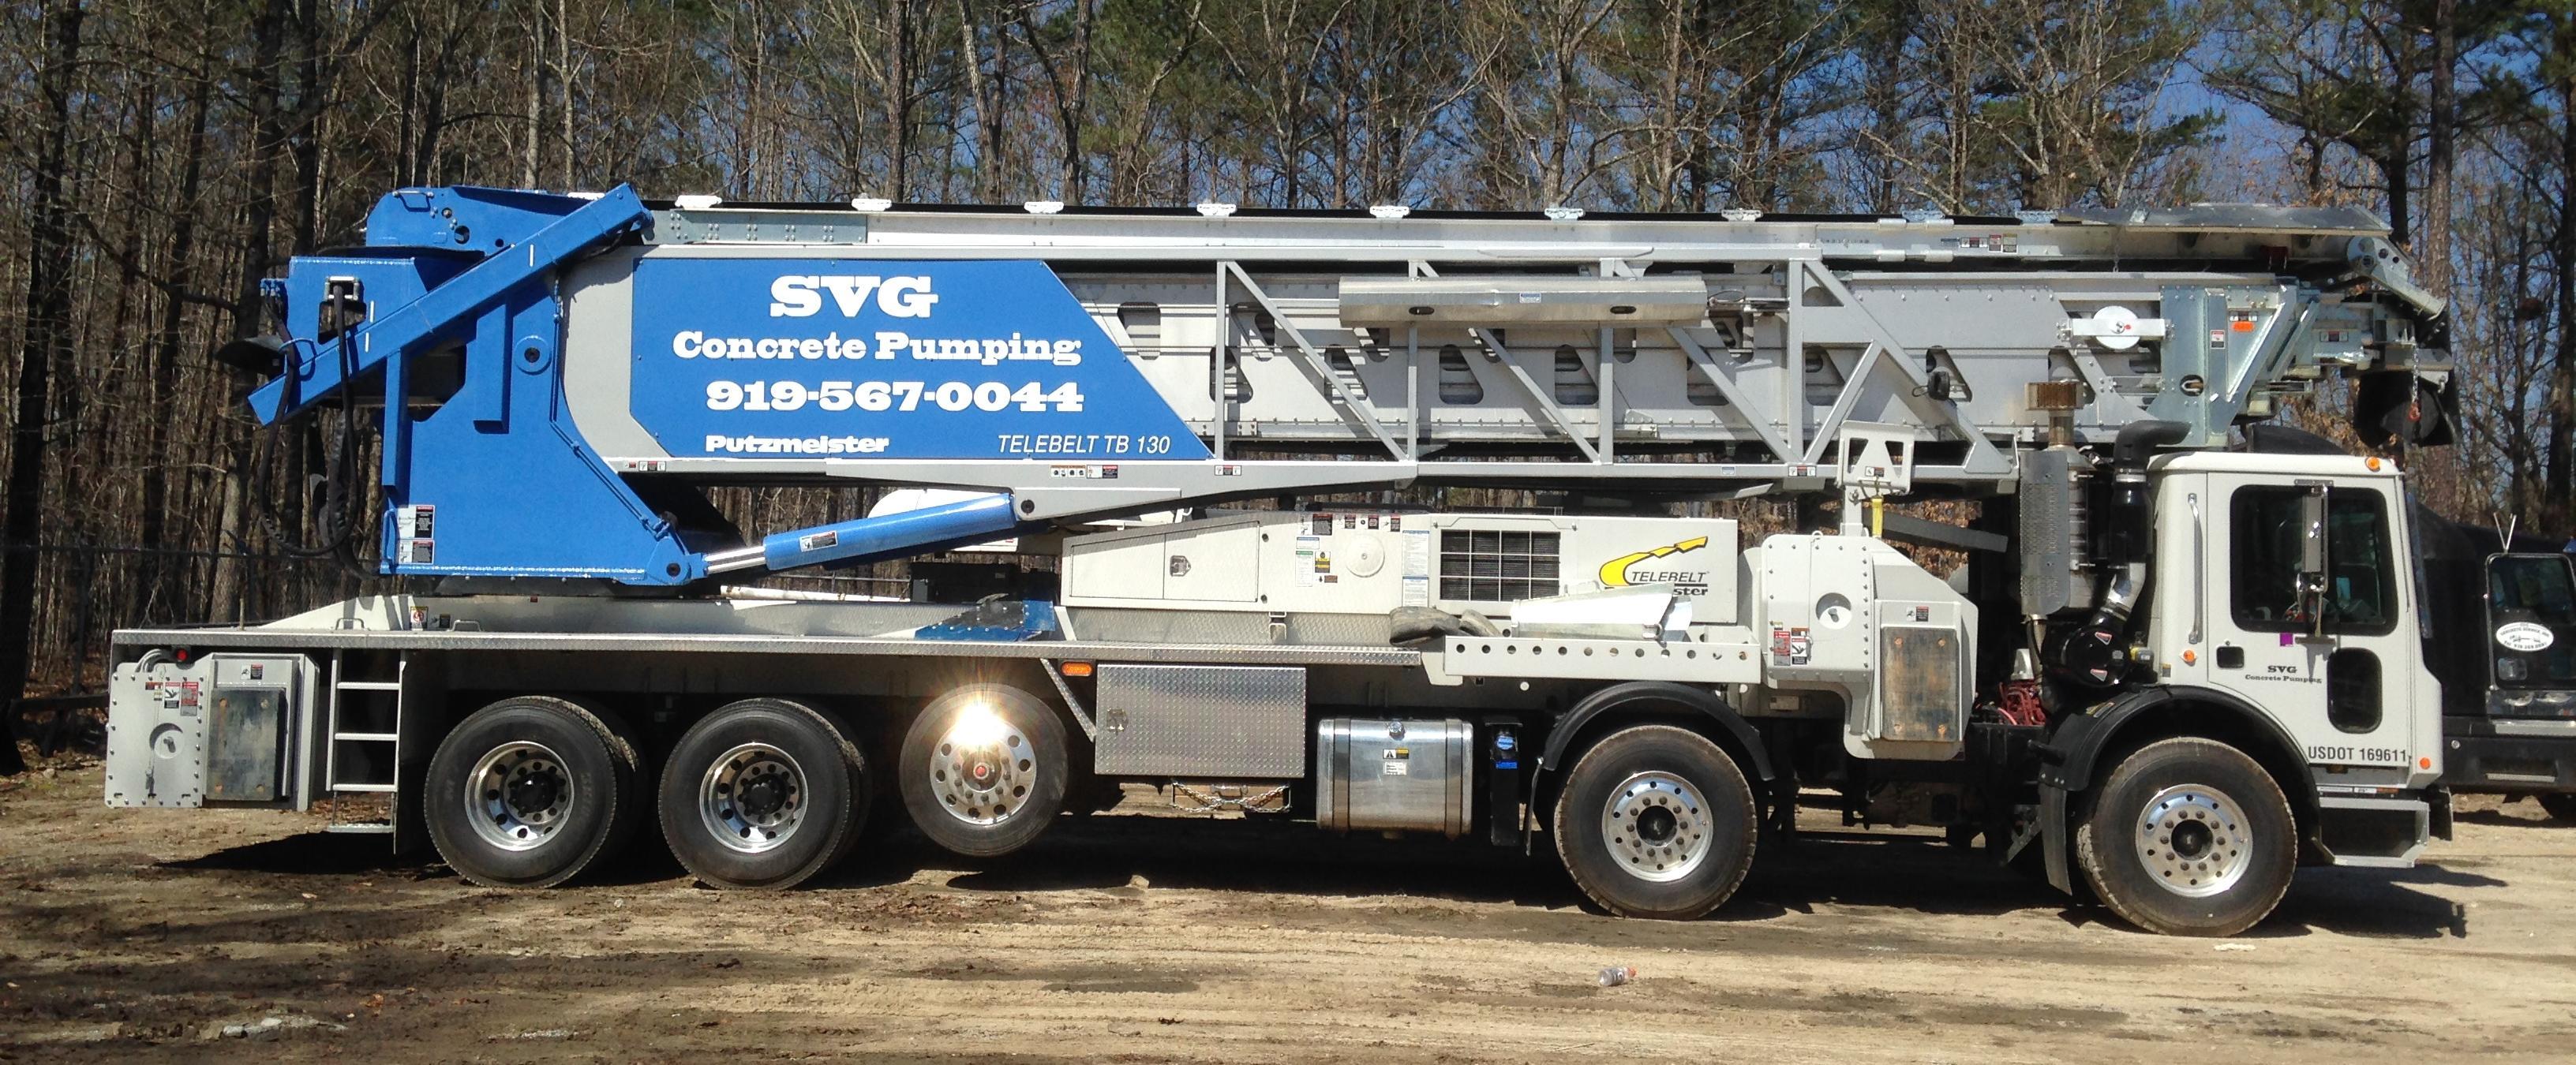 Svg Concrete Services Inc Cary North Carolina Proview